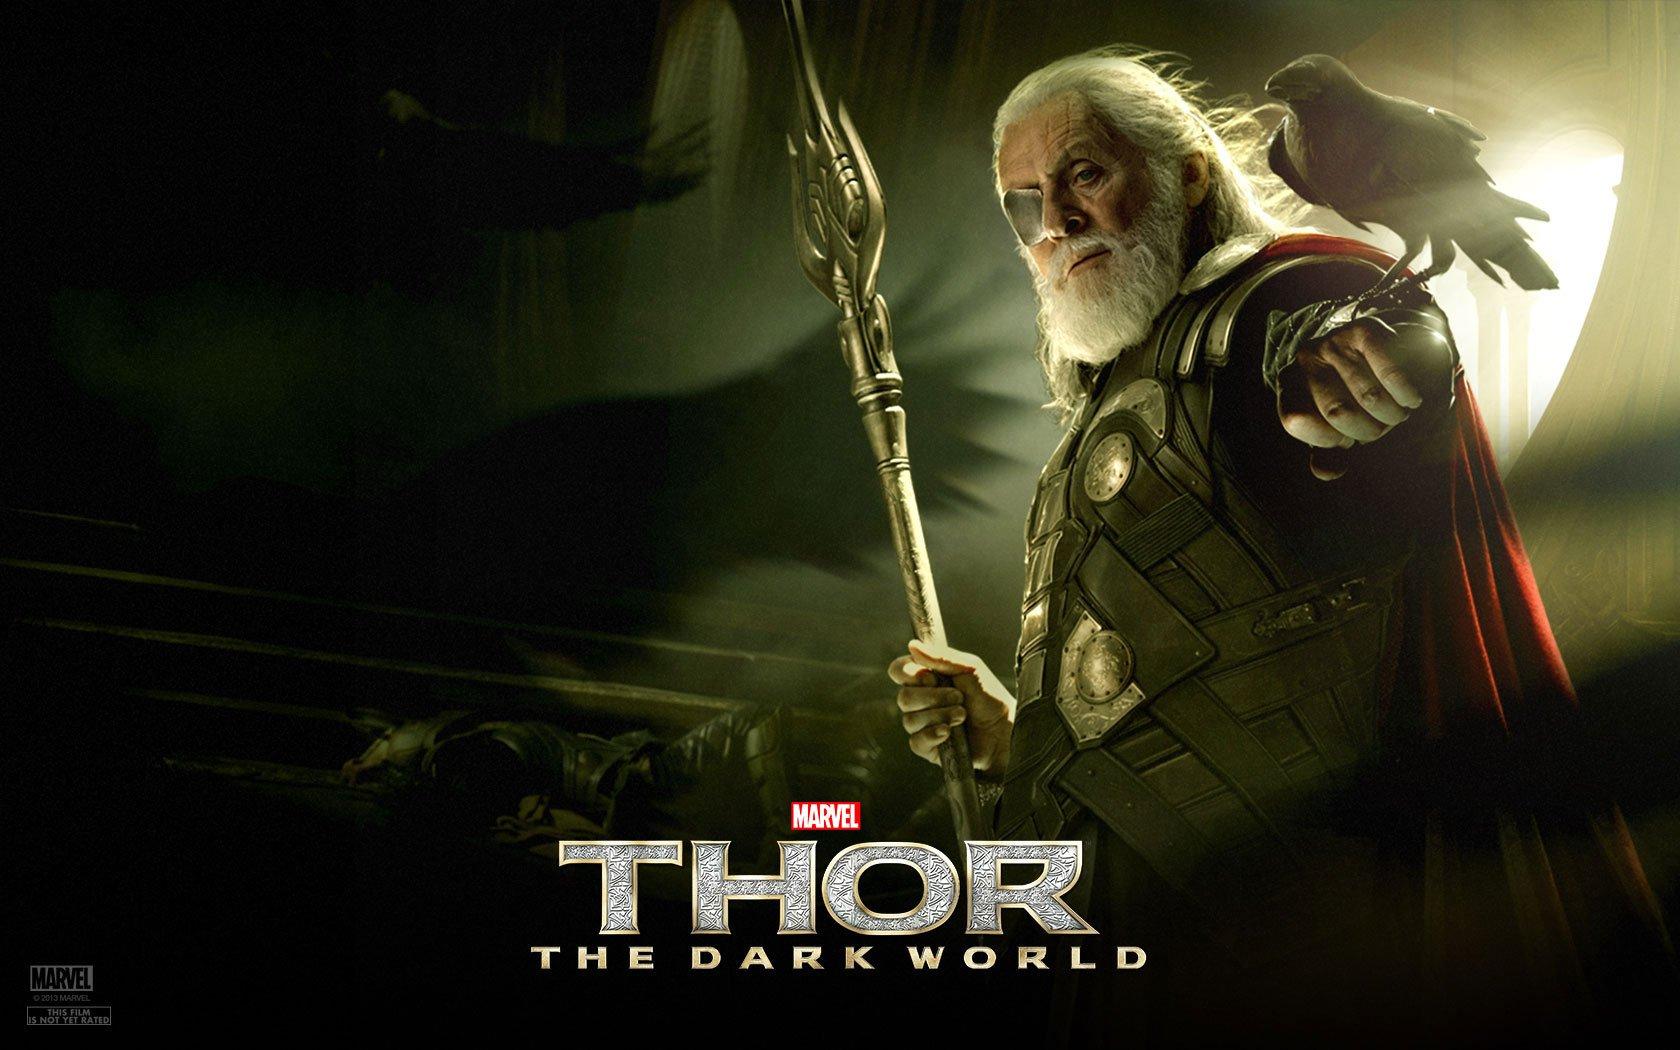 Thor 2 The Dark World 2013 Movie Wallpapers HD & Facebook ...